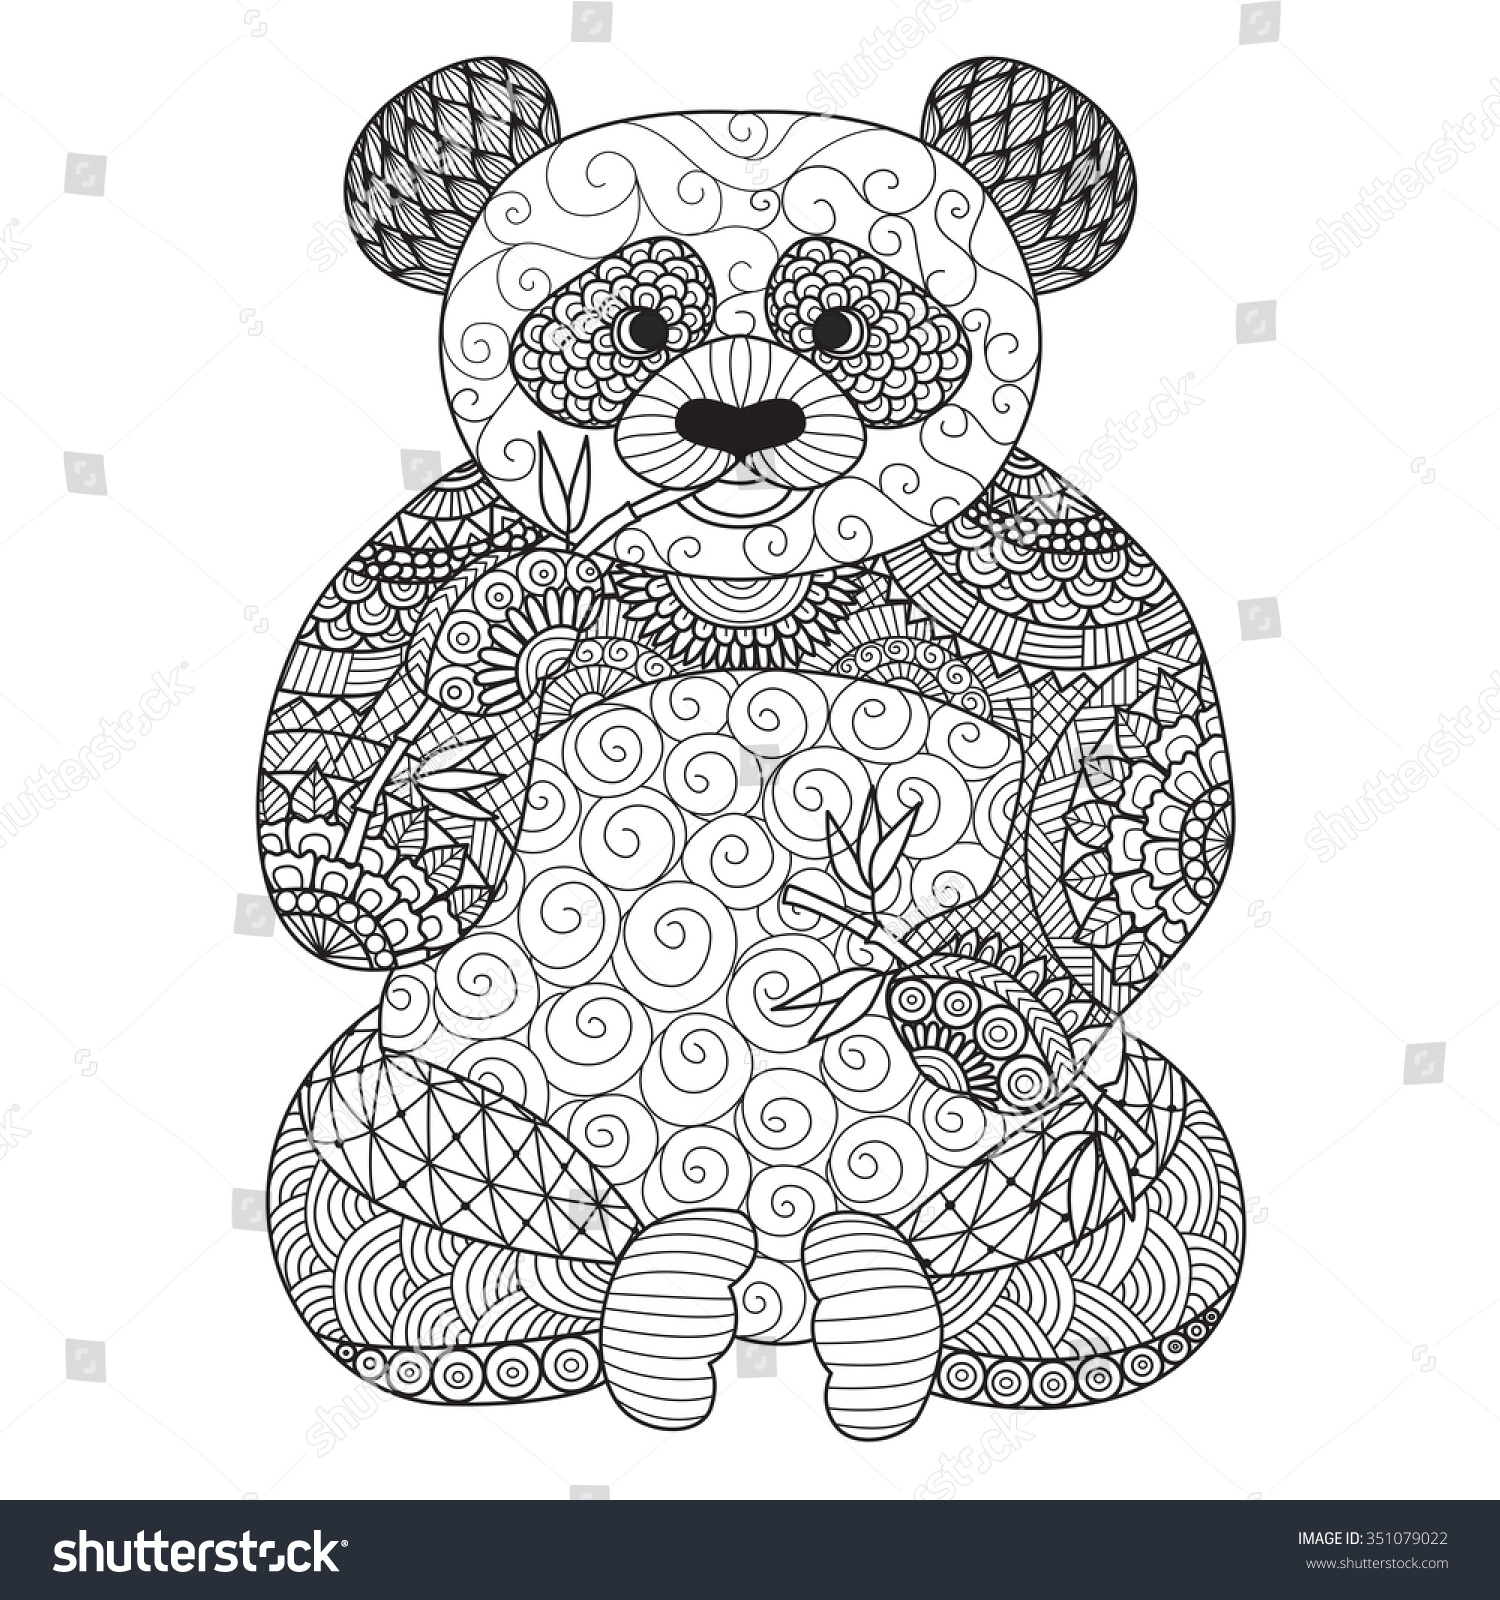 Hand Drawn Zentangle Panda Coloring Book Stock Vector